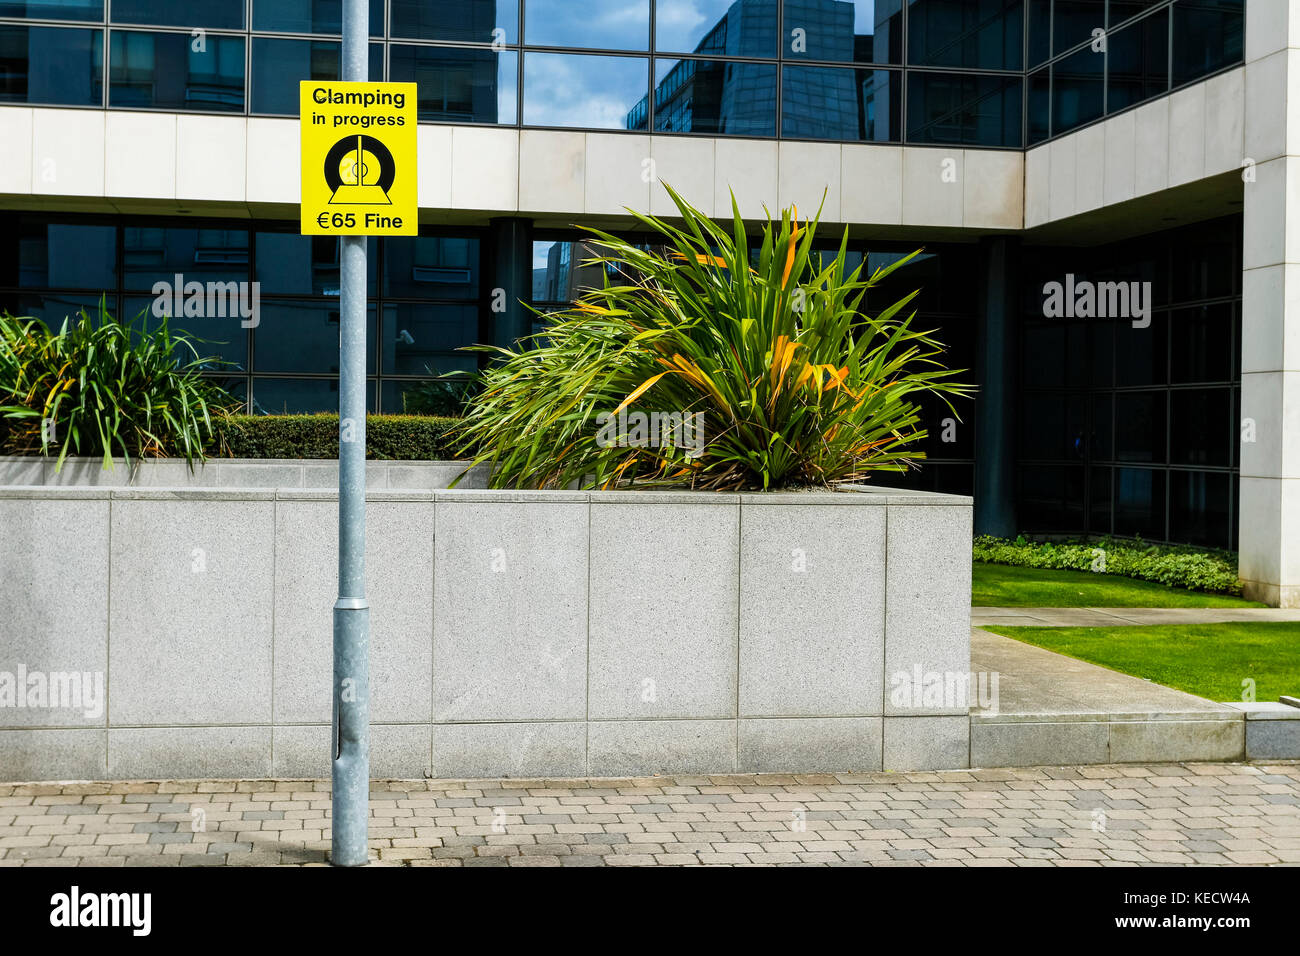 Clamping in progress sign, Dublin, Ireland - Stock Image